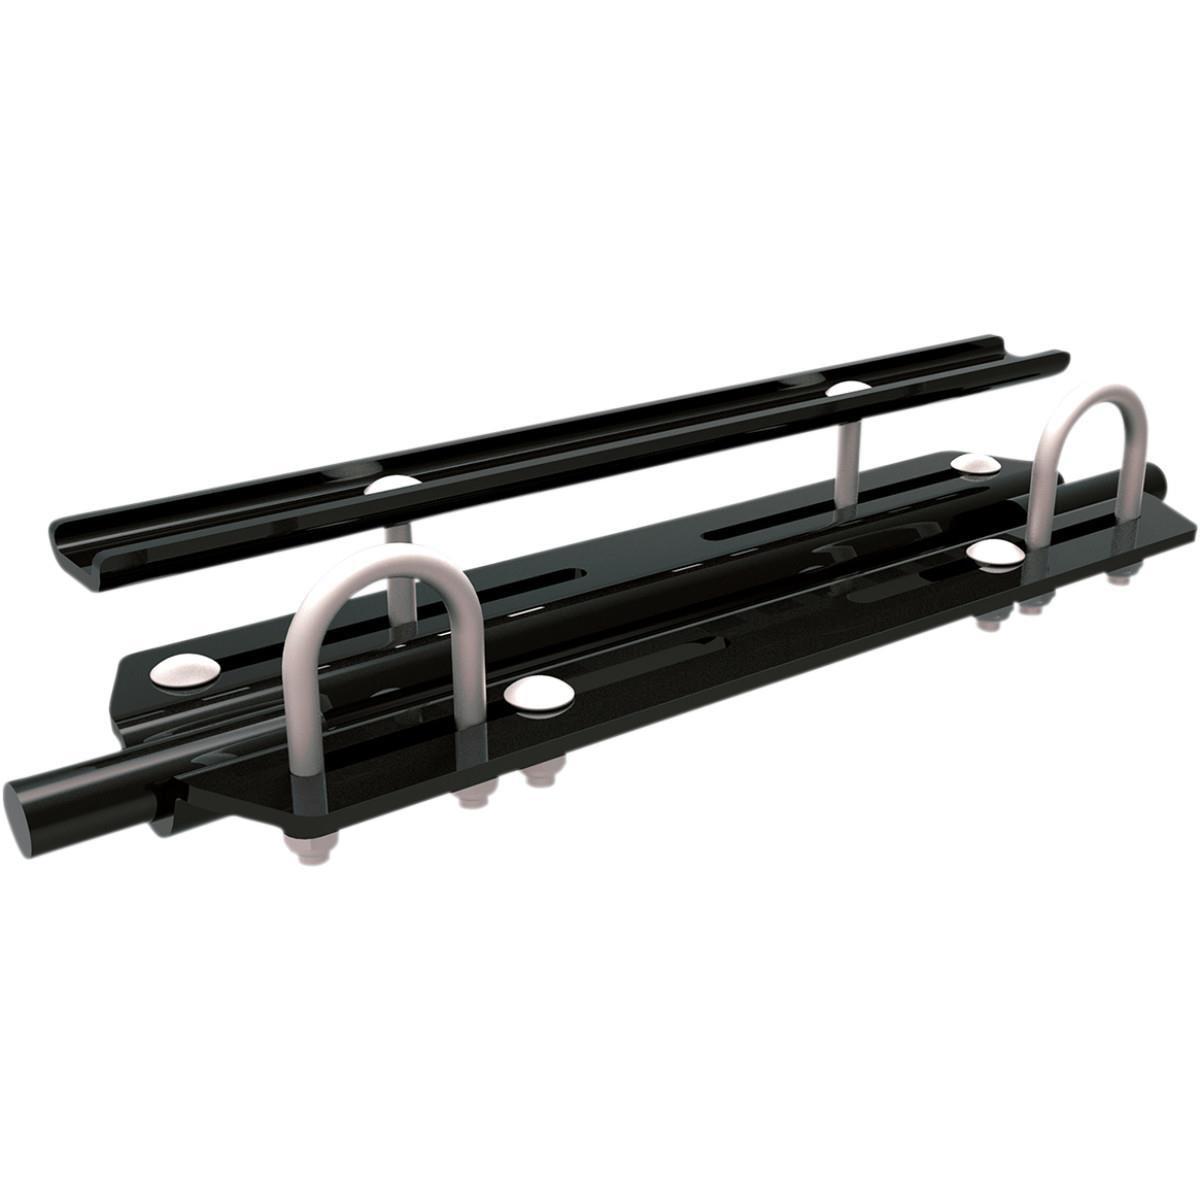 Kimpex Plow Bracket CNG 1.5